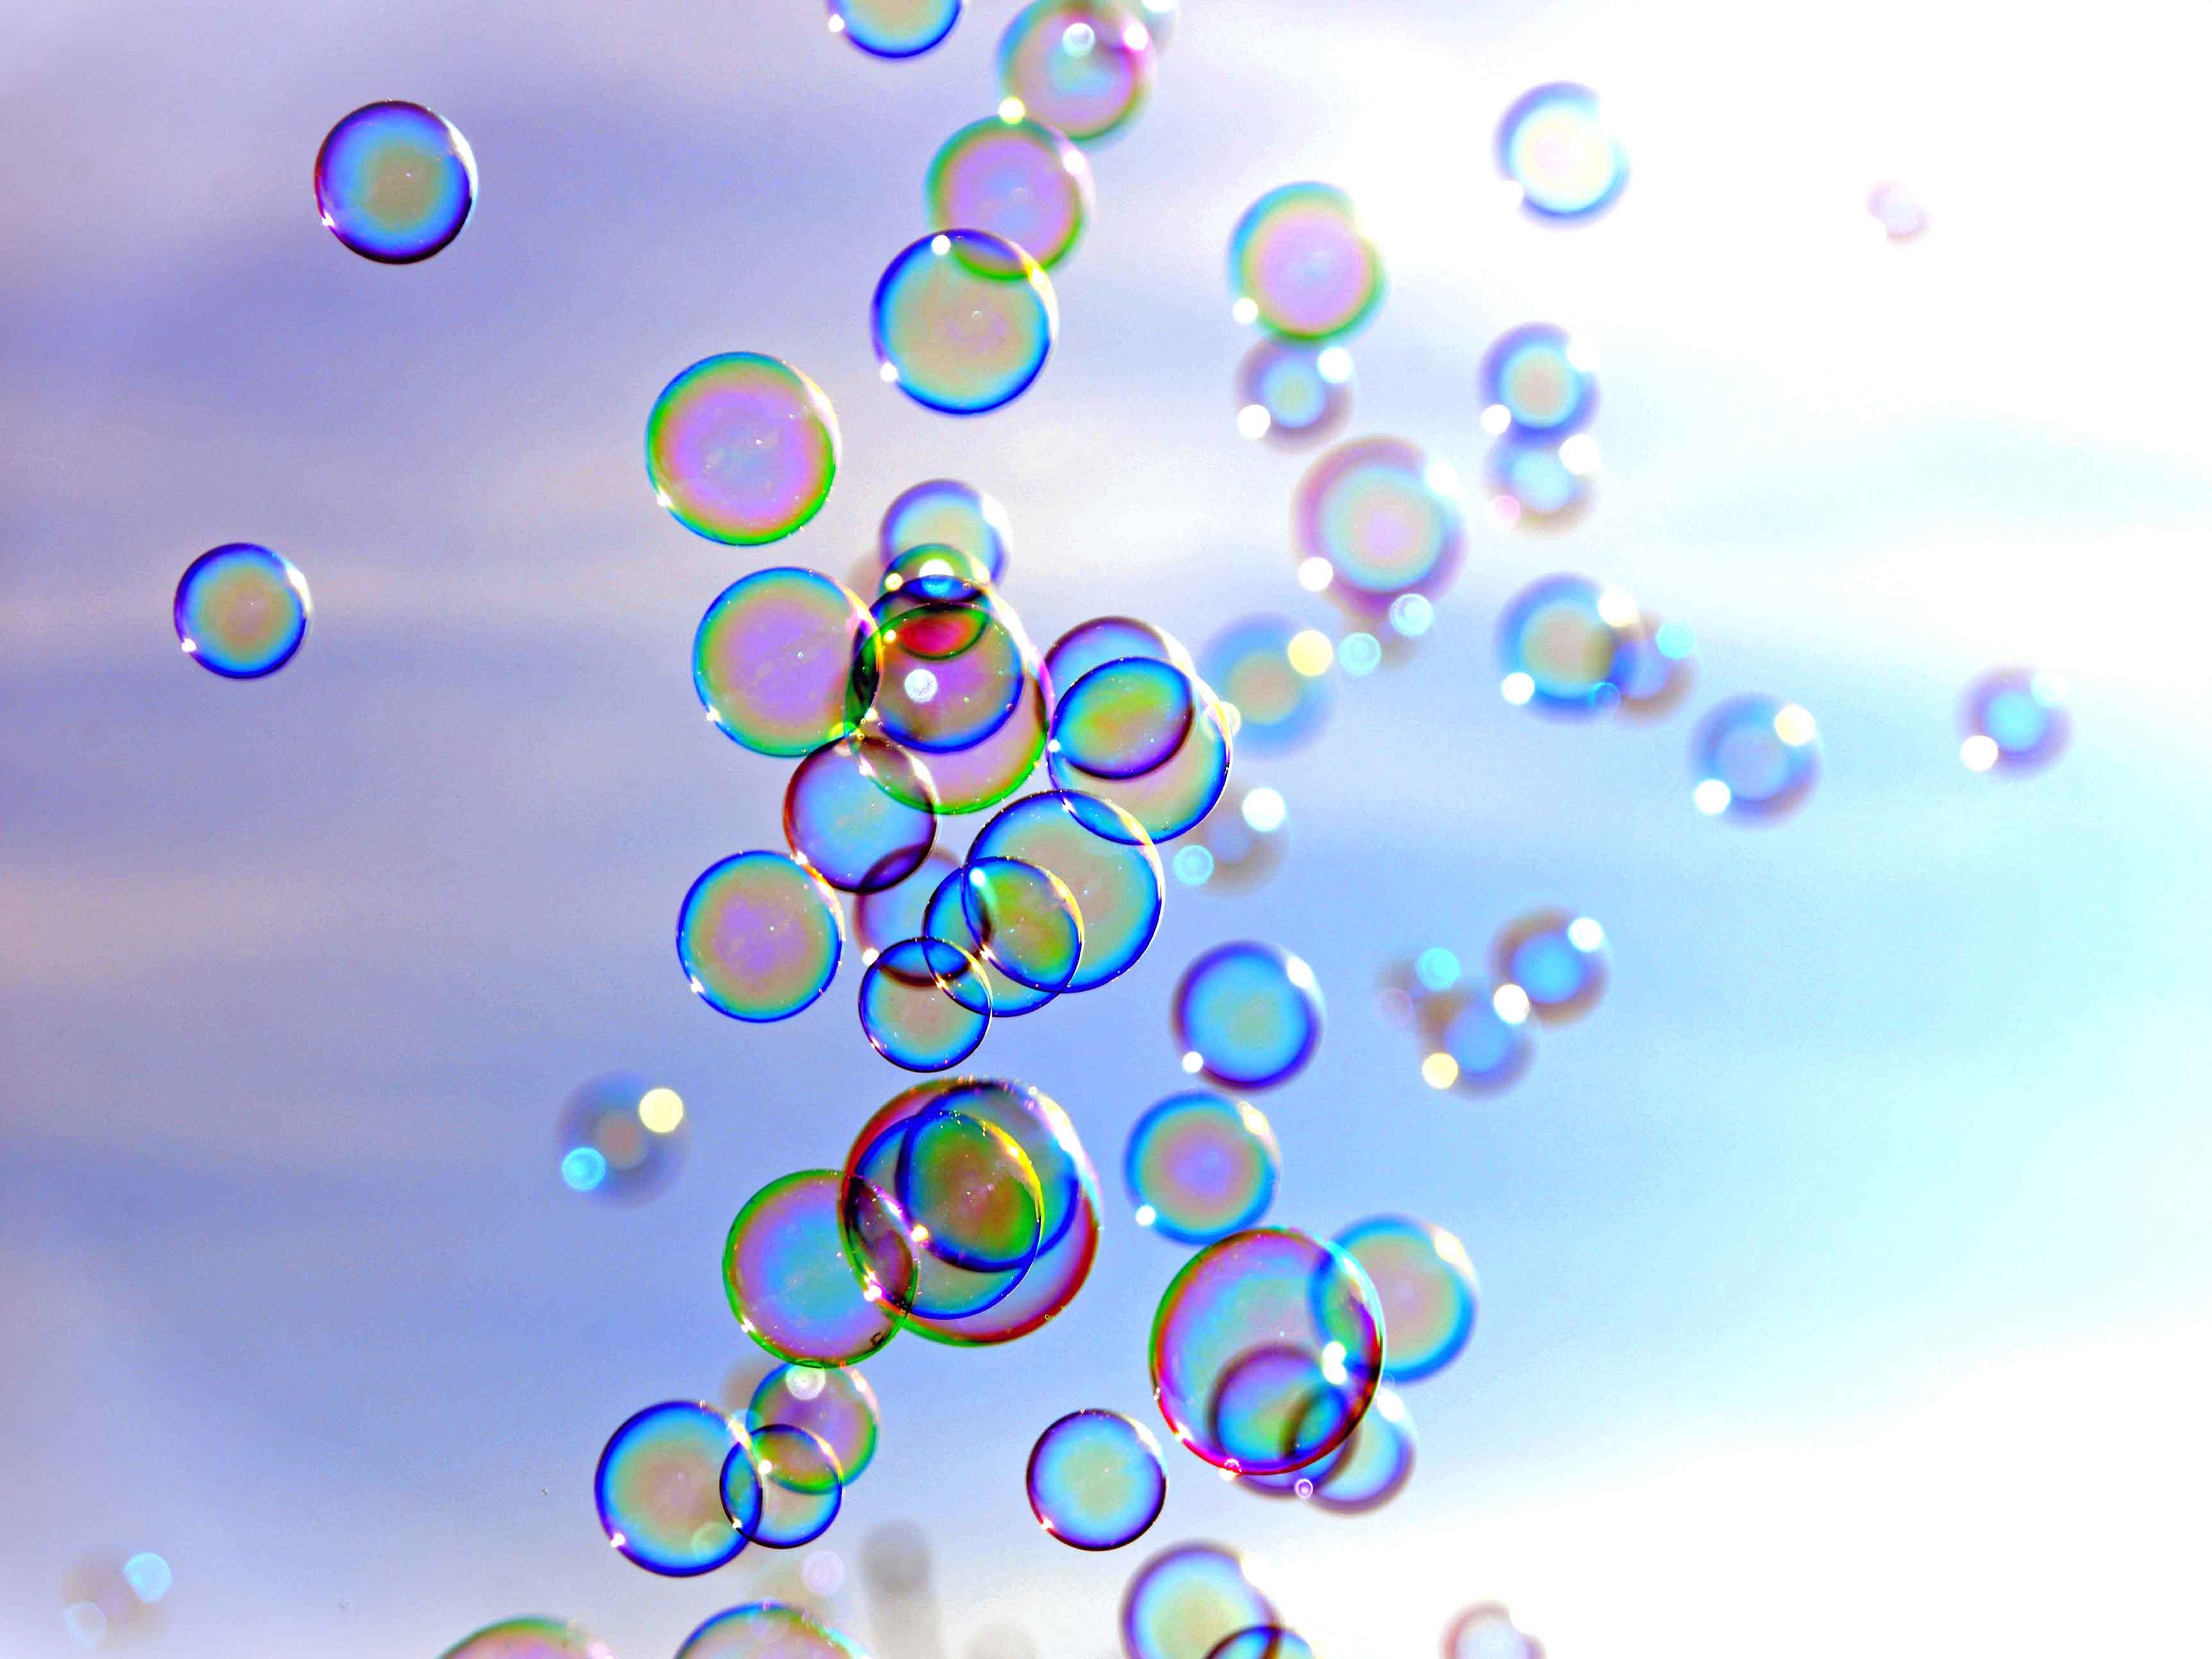 Seifenblasen (Bildquelle: congerdesign / pixabay, in pfarrbriefservice.de)